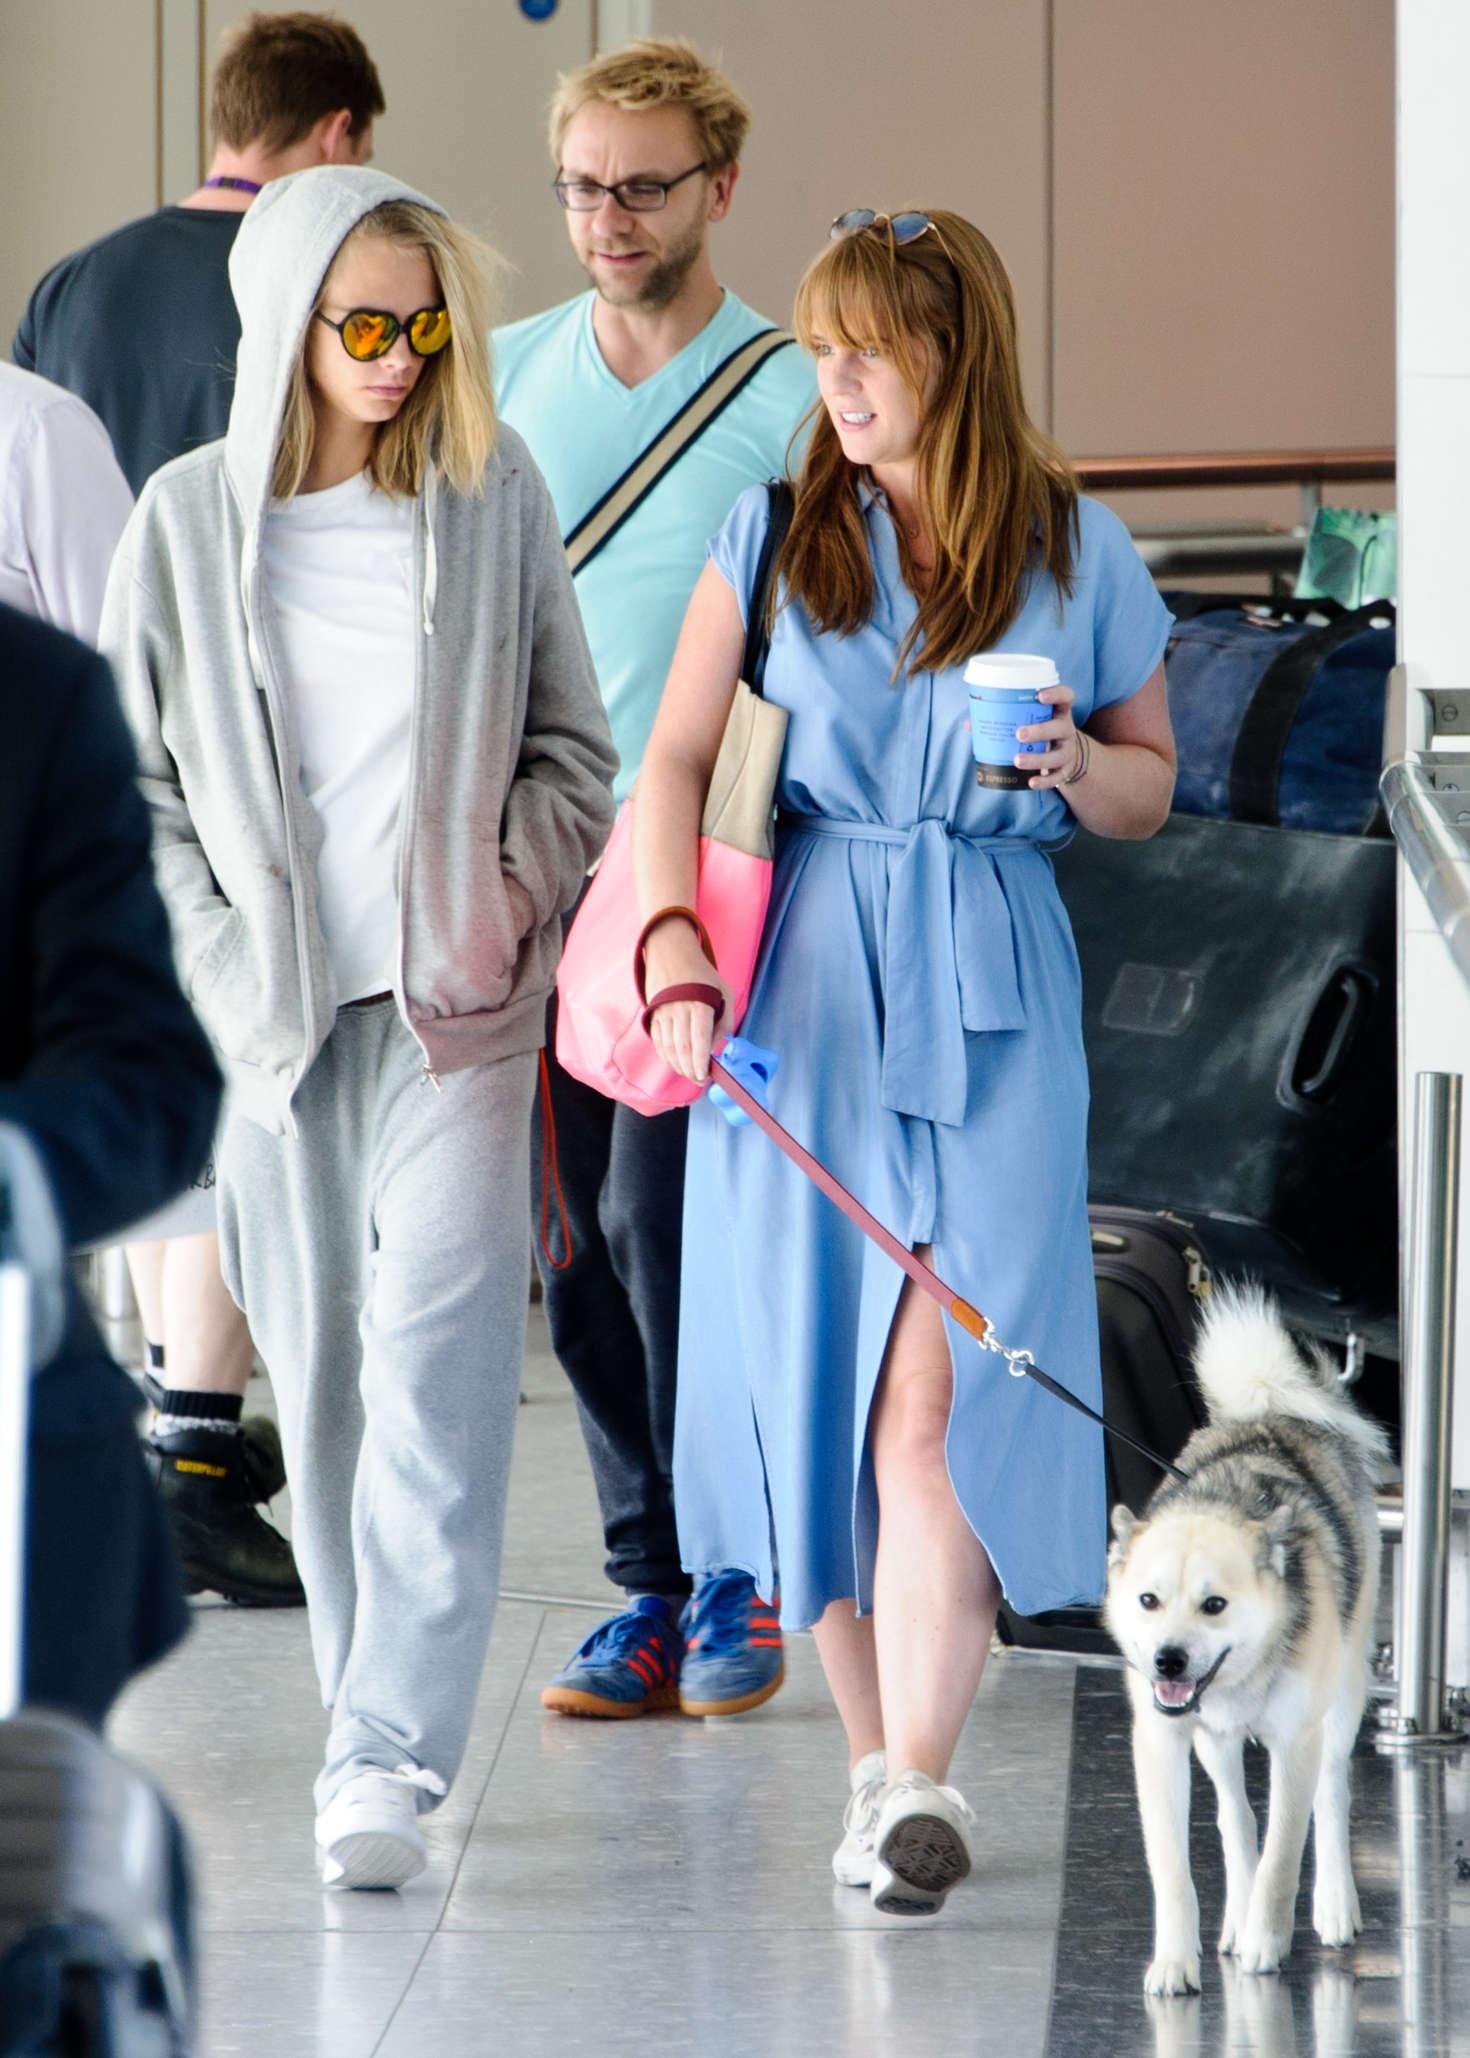 Cara Delevingne 2016 : Cara and Poppy Delevingne Arrive at Heathrow Airport -03